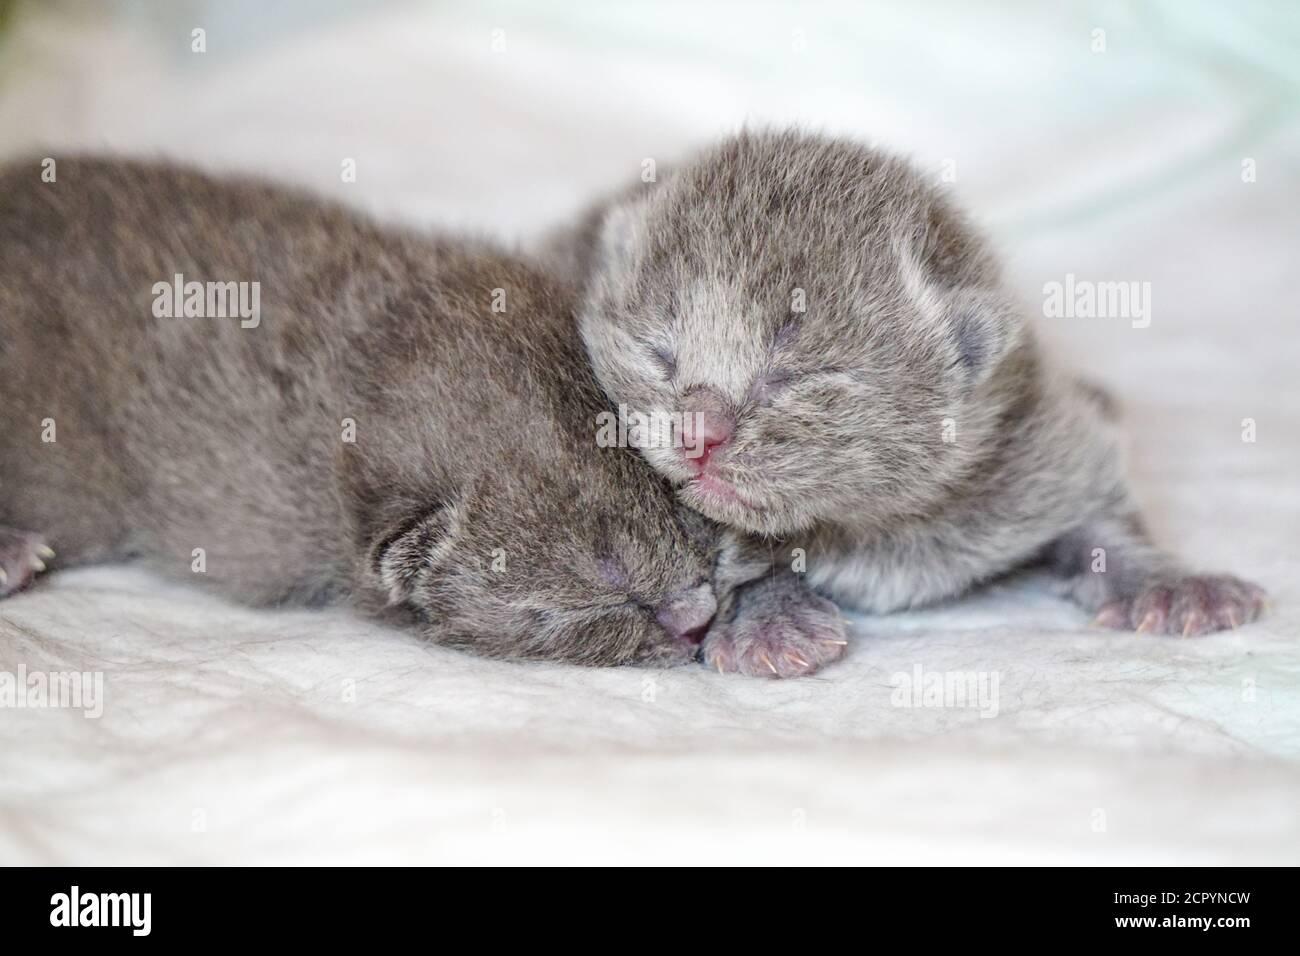 New Born Scottish Fold Kittens On White Background Close Up View Stock Photo Alamy